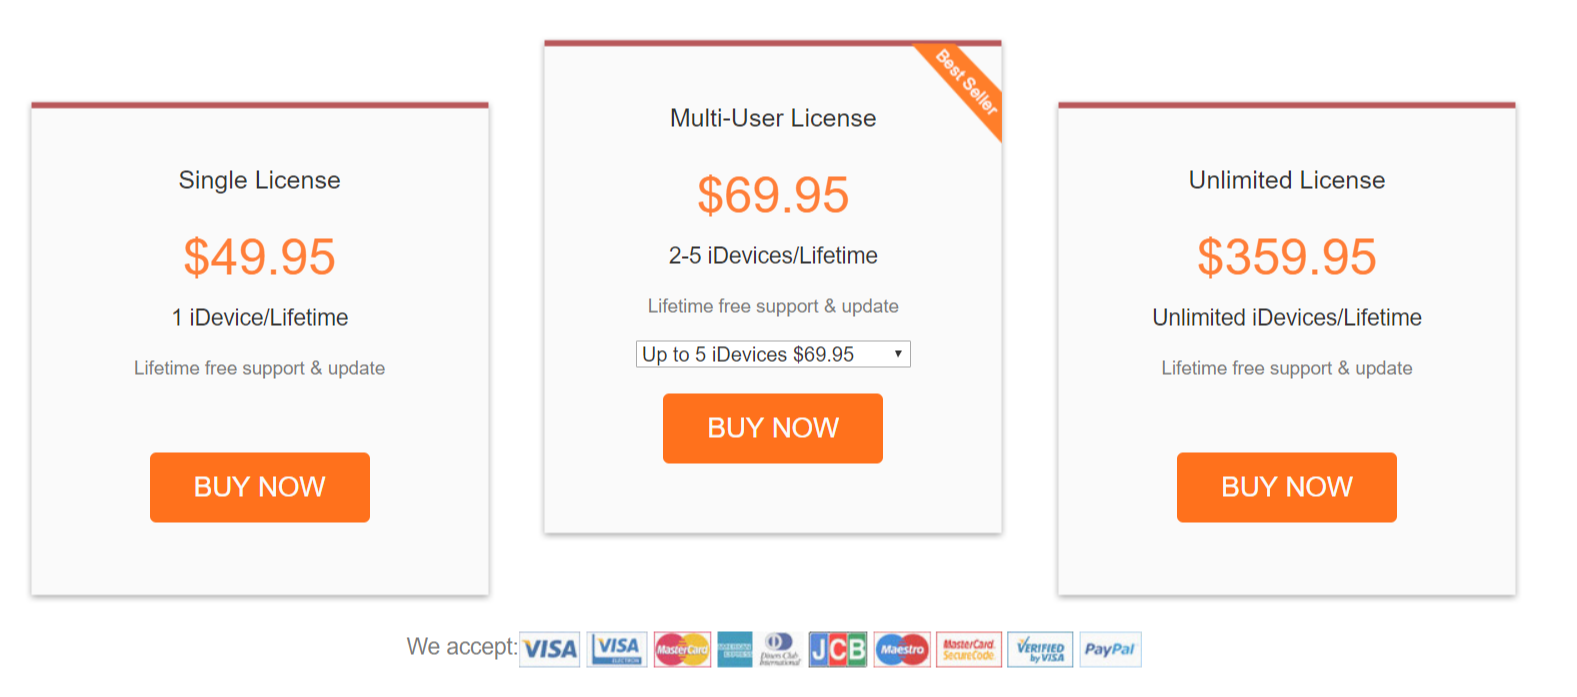 Joyoshare Review- Pricing